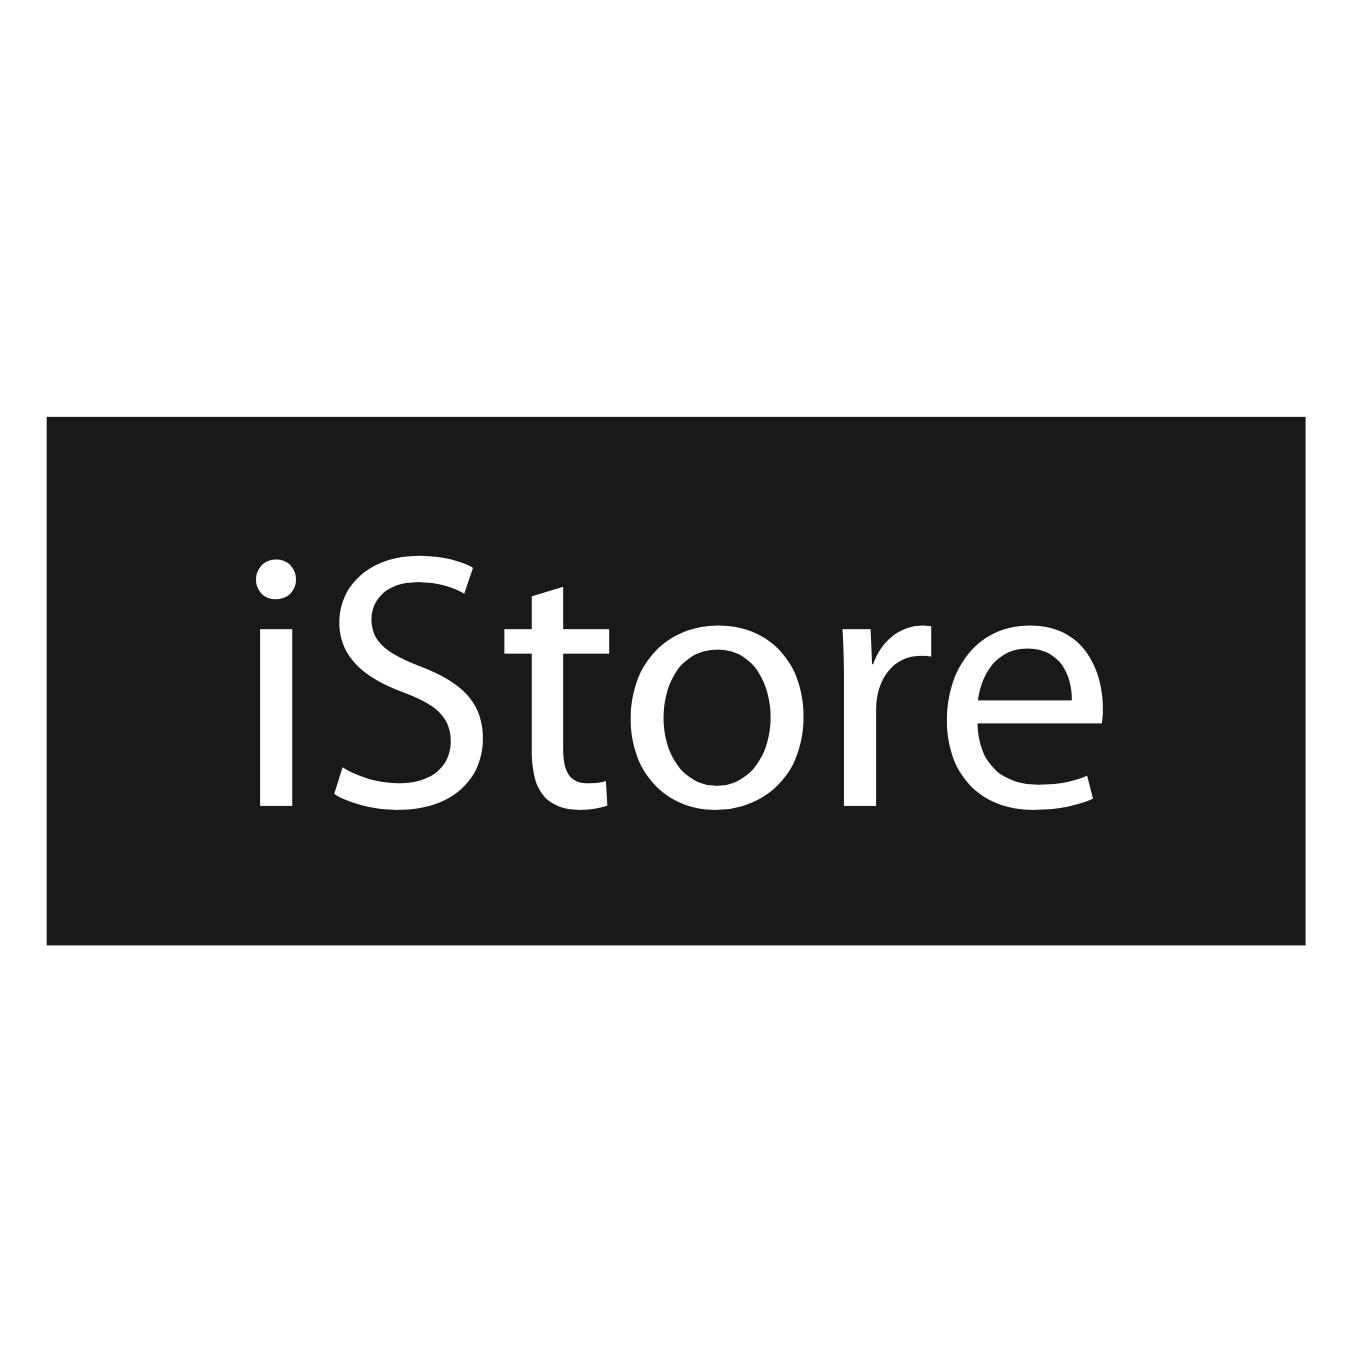 iPhone 7 Plus Silicone Case - White